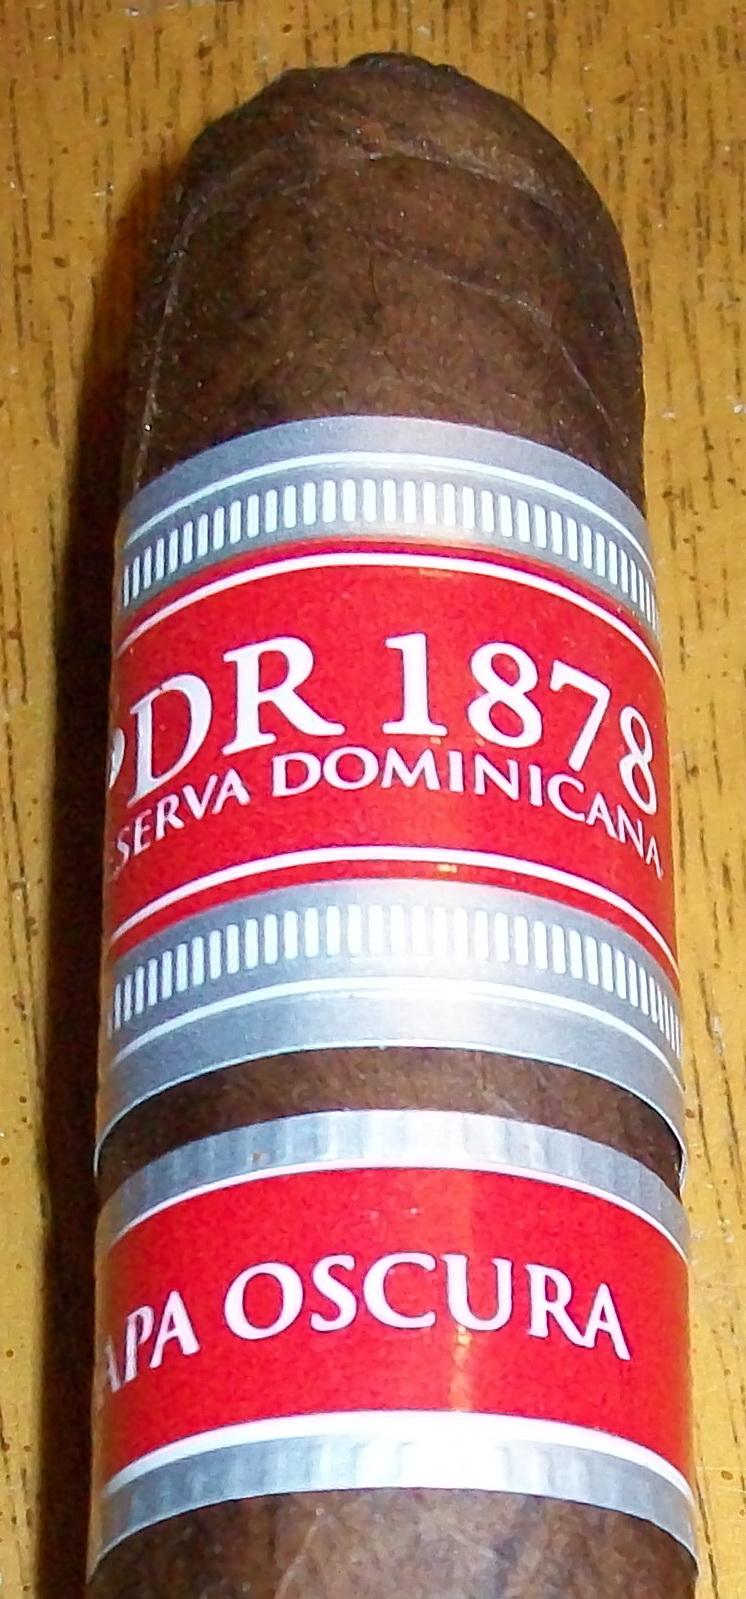 Cigar Review: PDR 1878 Reserva Dominicana Capa Oscura